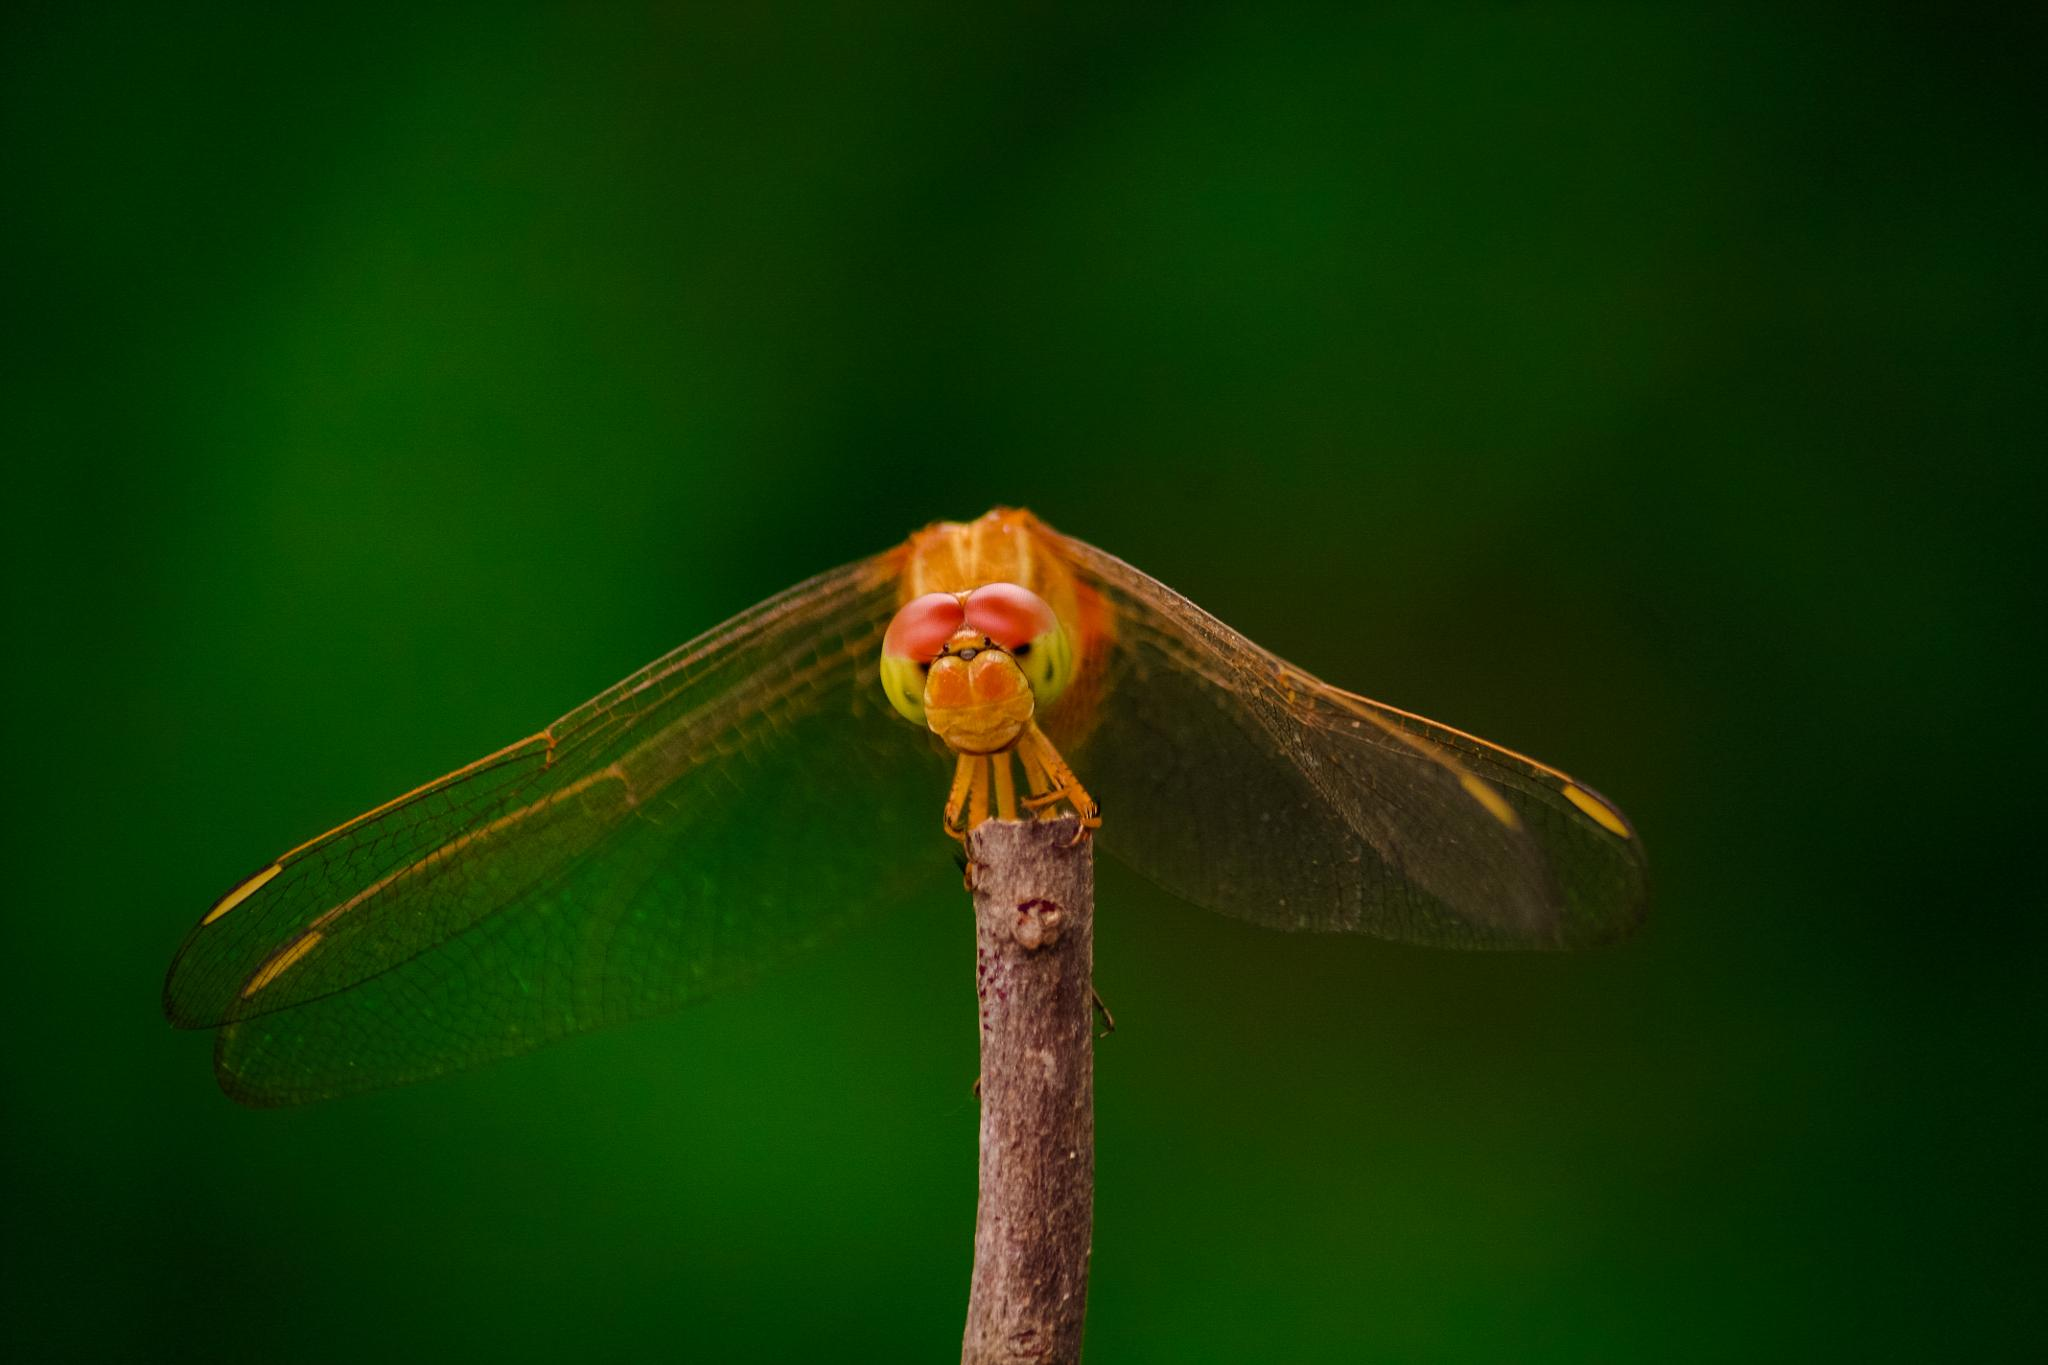 dragonfly by skamin